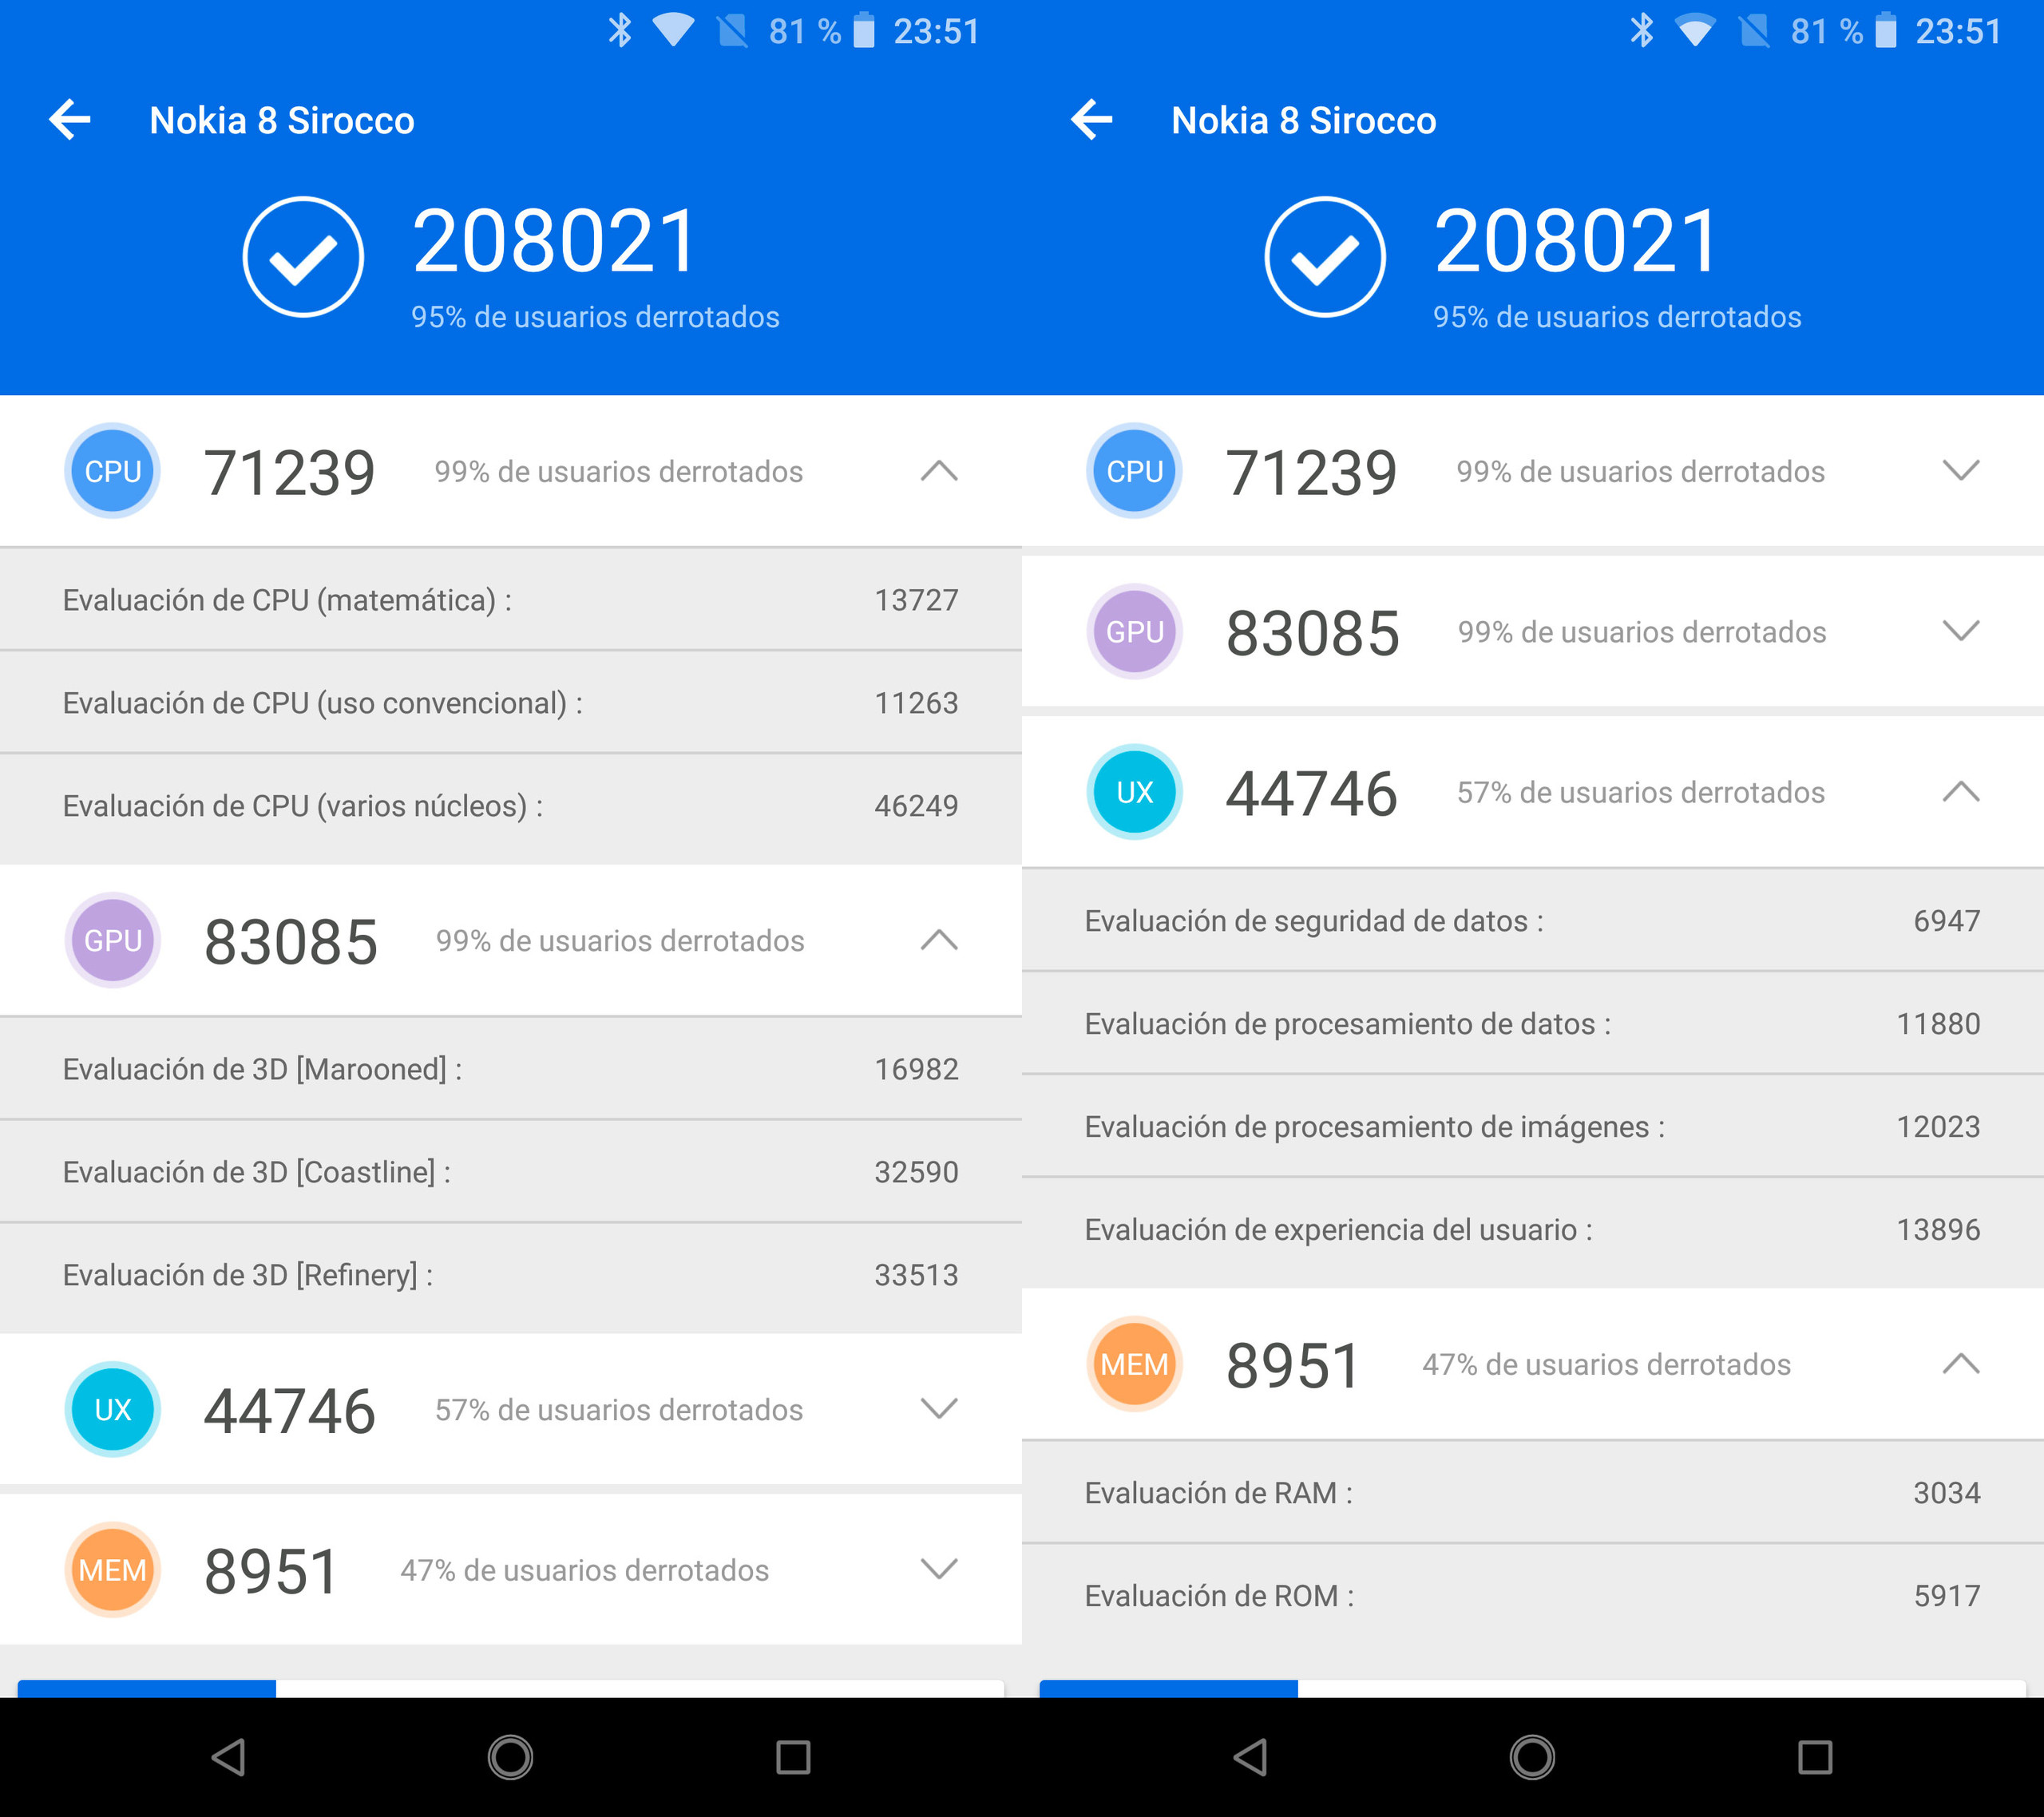 Nokia 8 Sirocco, benchmarks